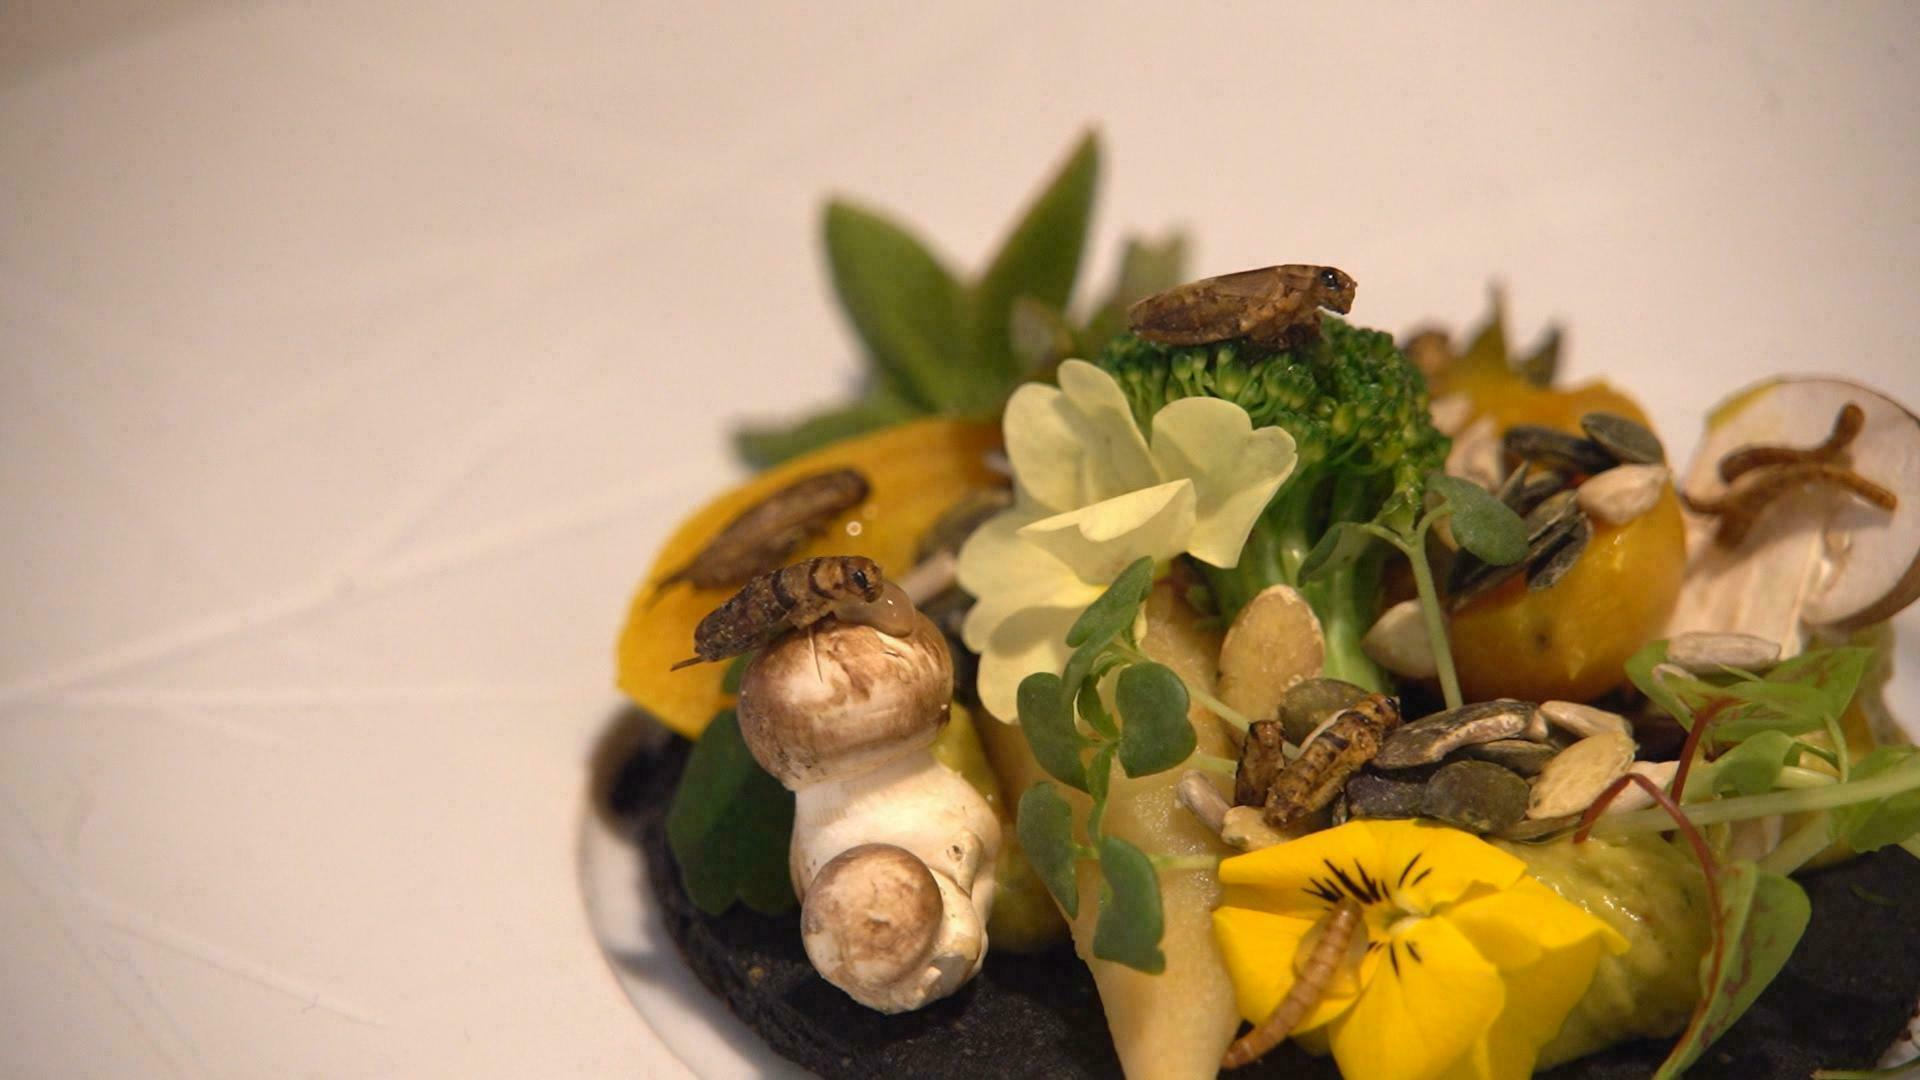 Insectes comestibles : des vers au menu